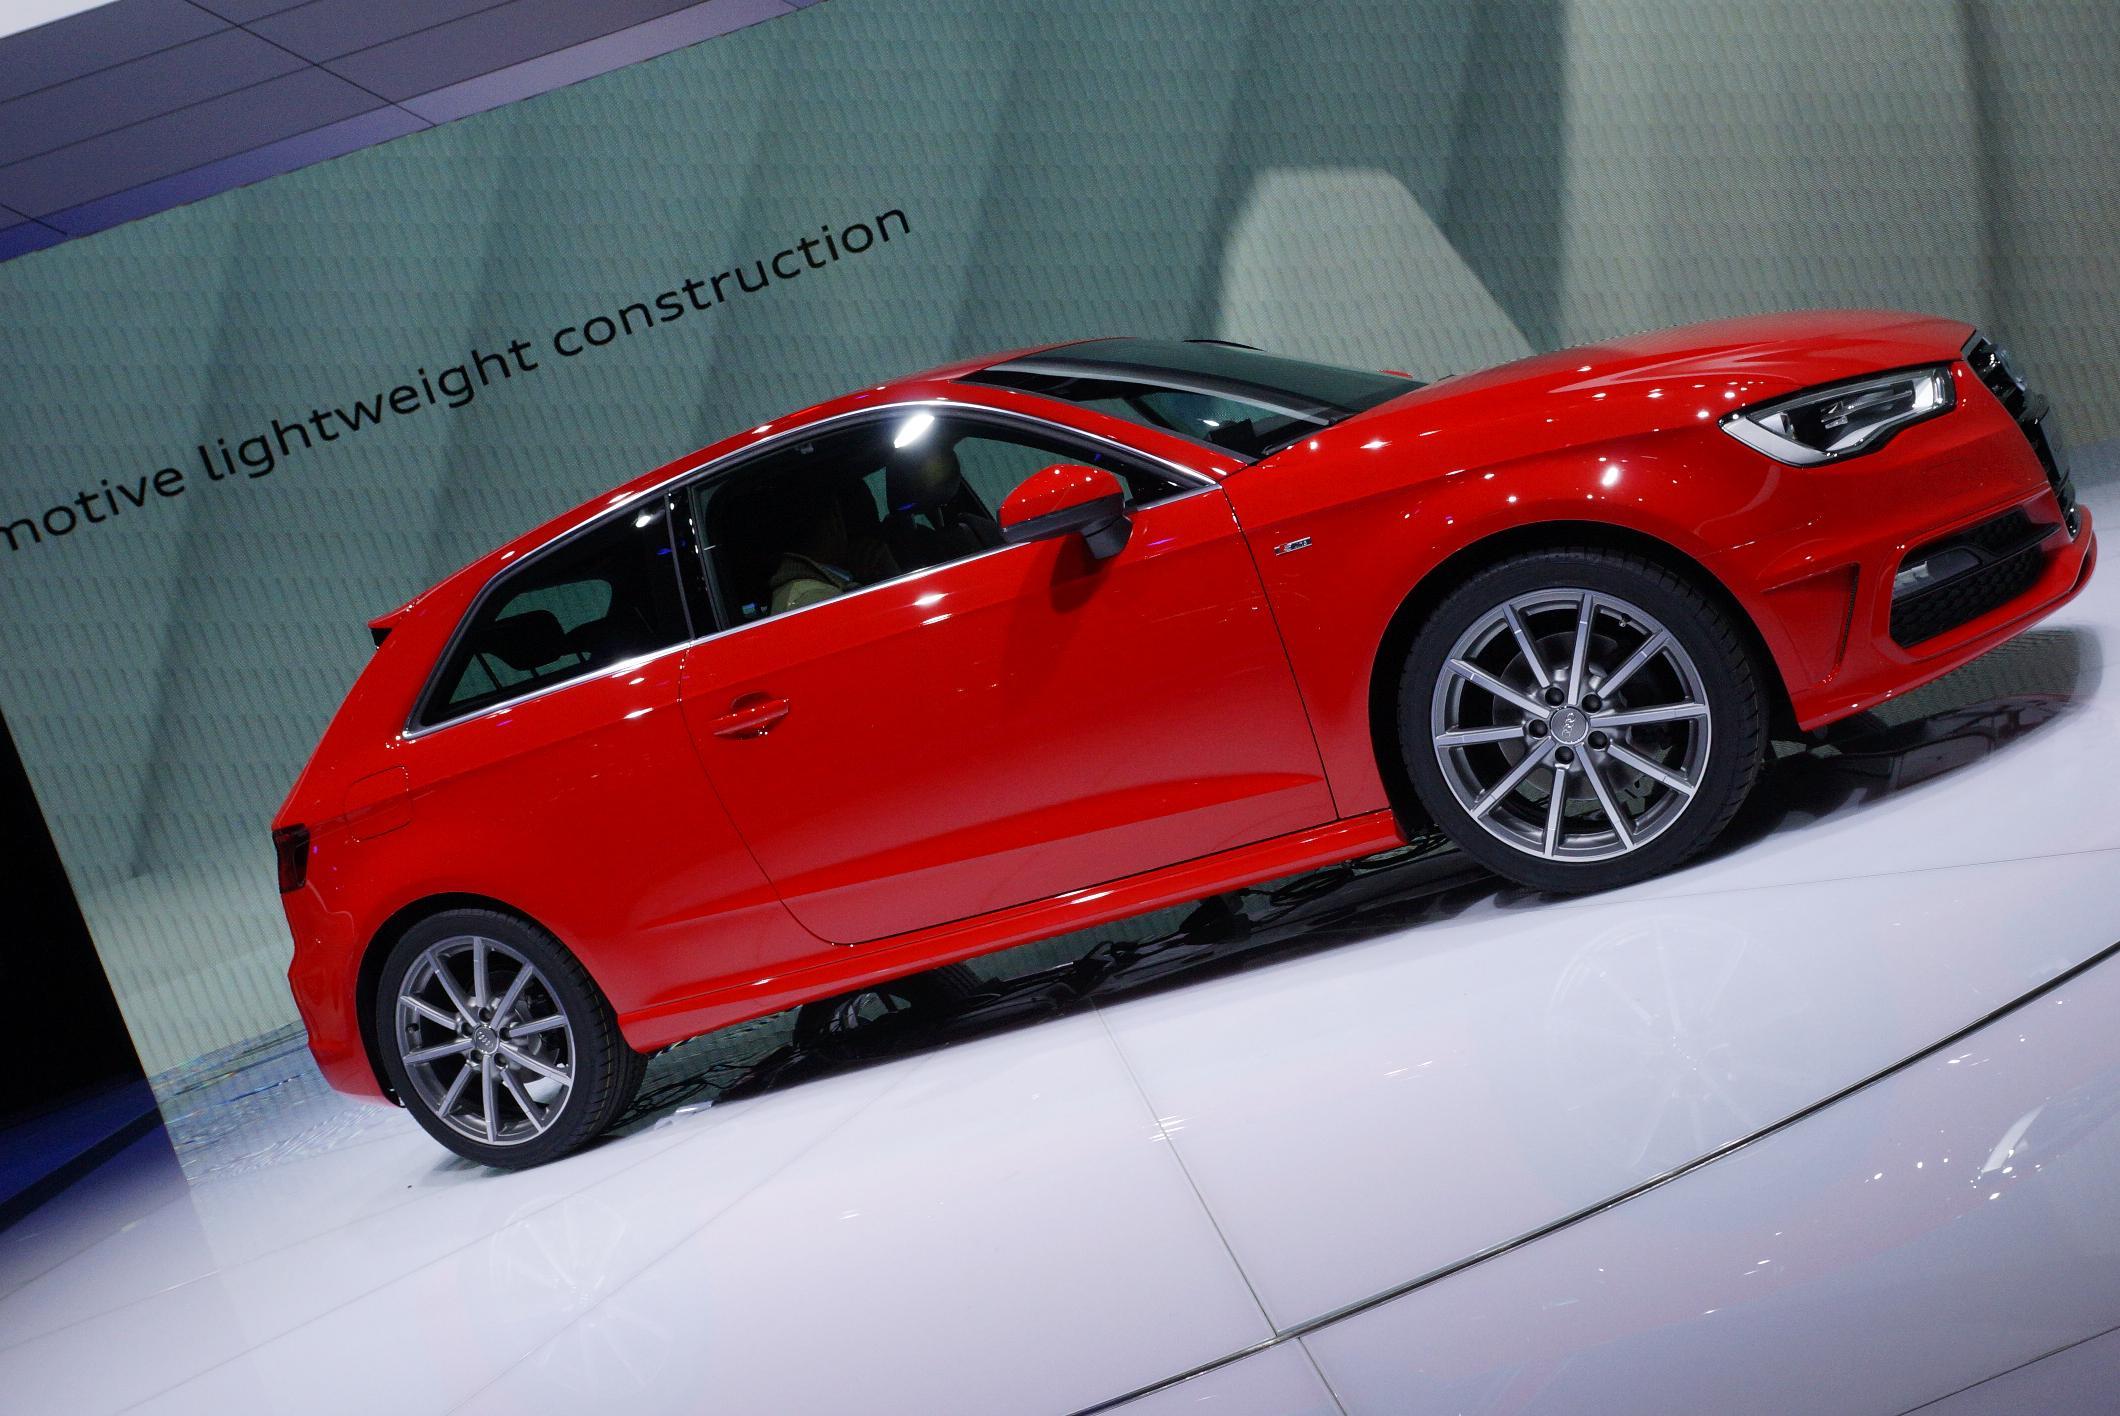 Audi A3 Geneva 2012 Side 2